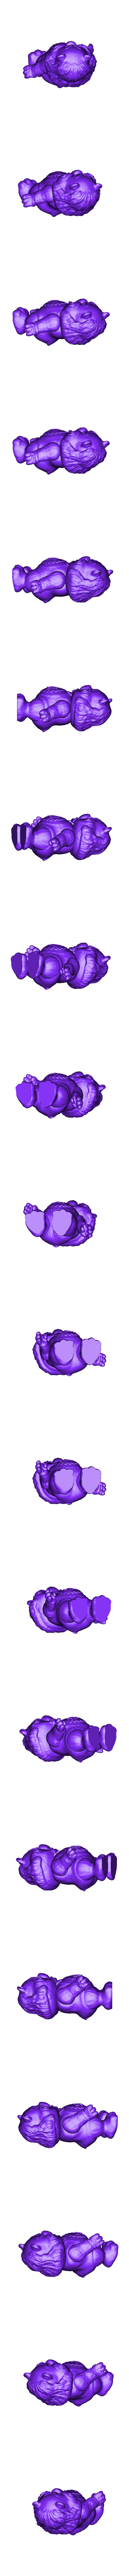 jigsaw bear.stl Download STL file No Care Bear Collection #3 • 3D printer object, LittleTup